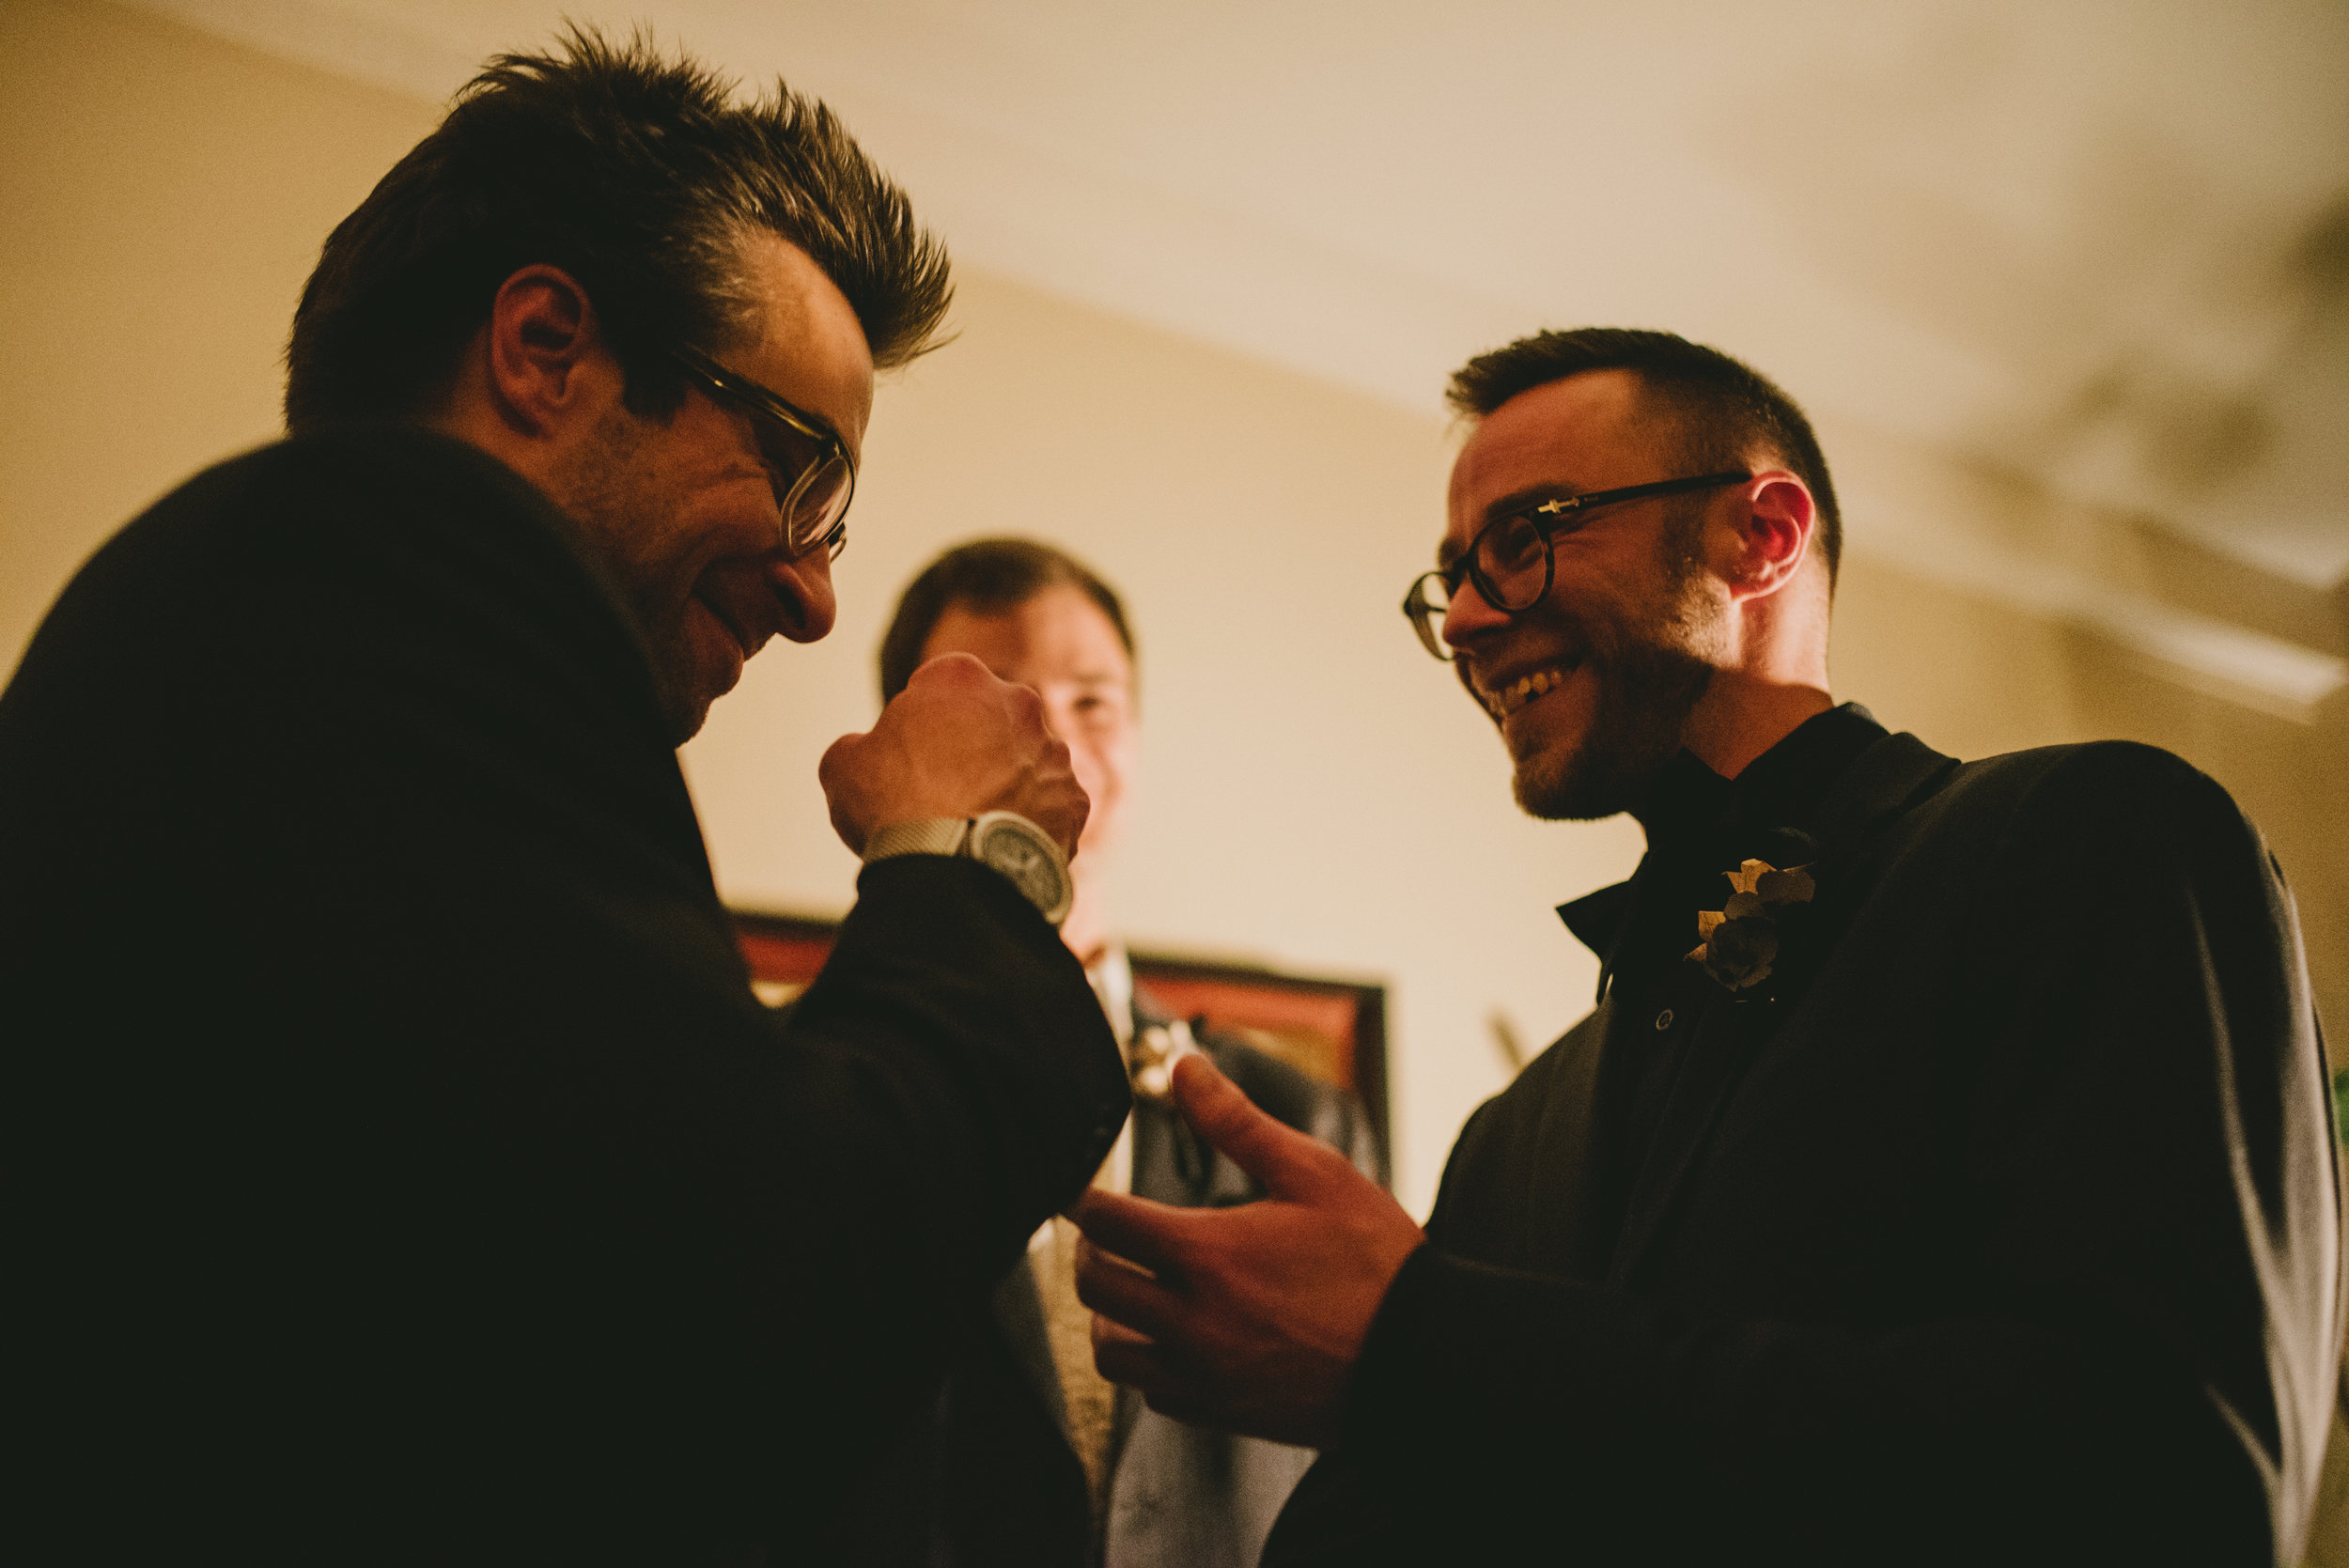 intimate-same-sex-wedding-ceremony-photos.jpg